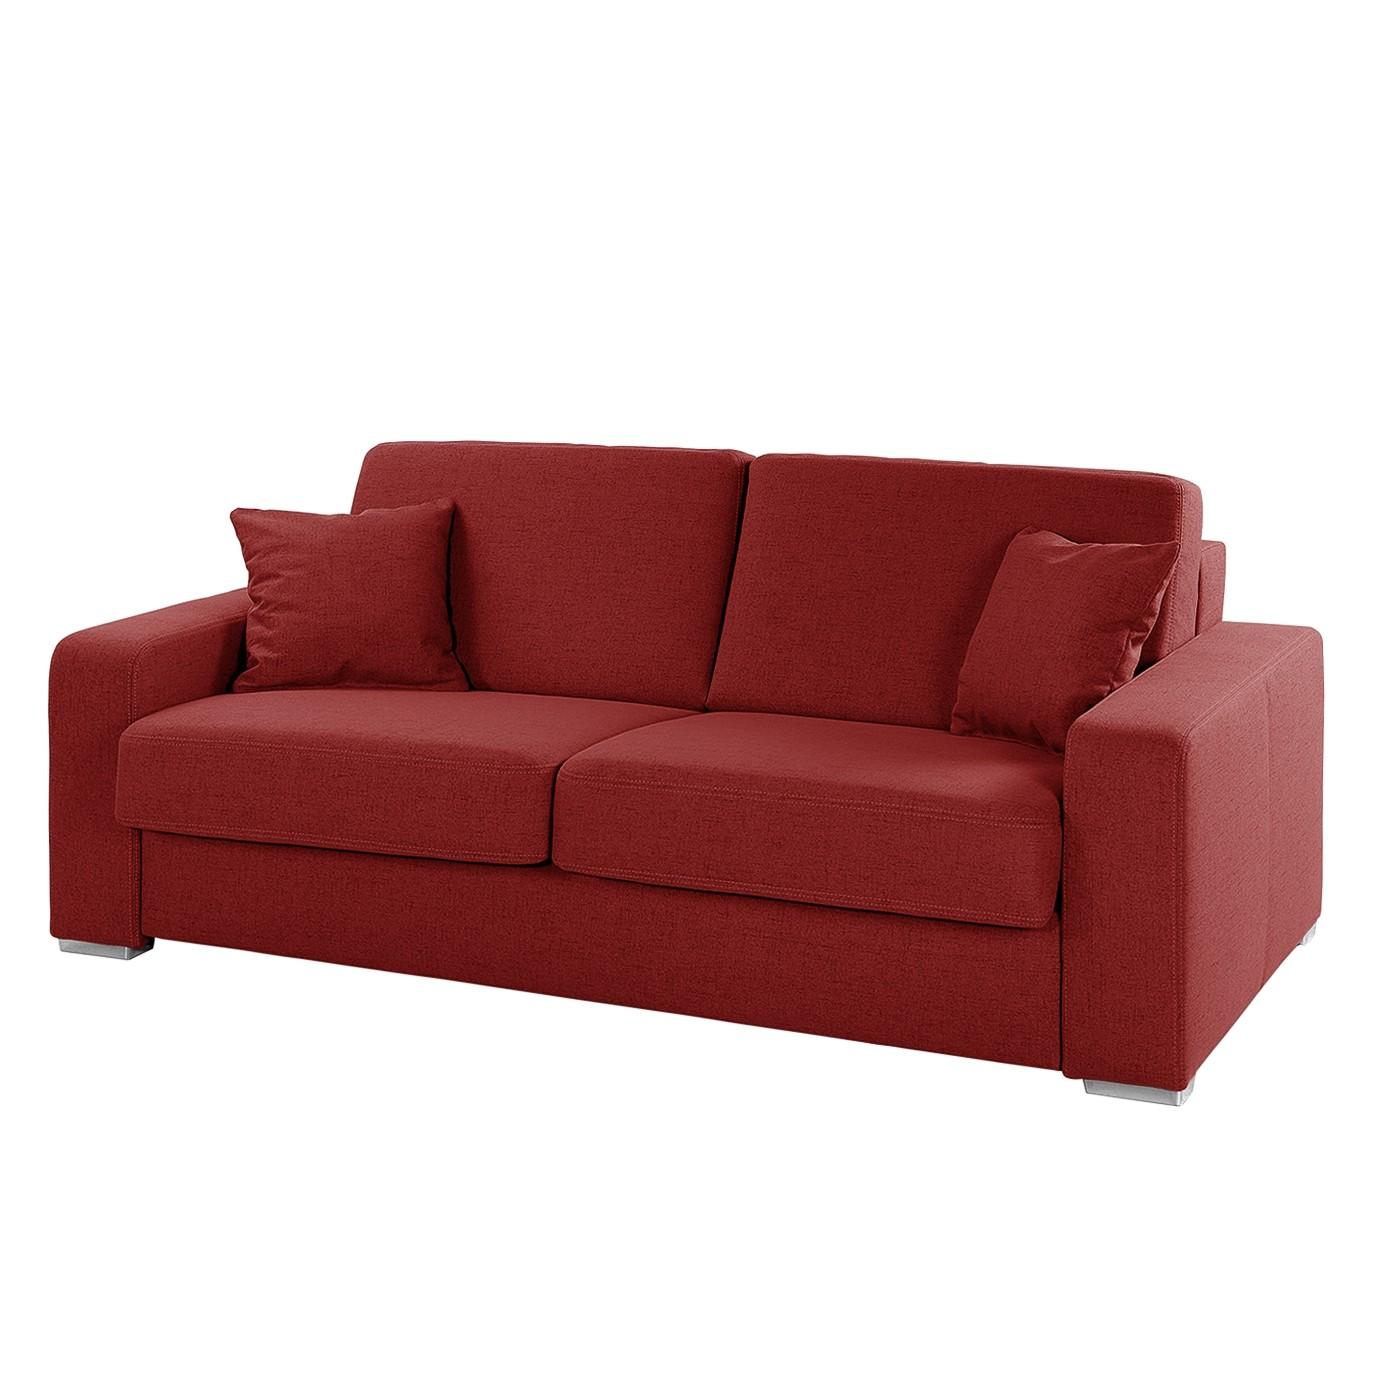 goedkoop Slaapbank Coro geweven stof Rood Home Design